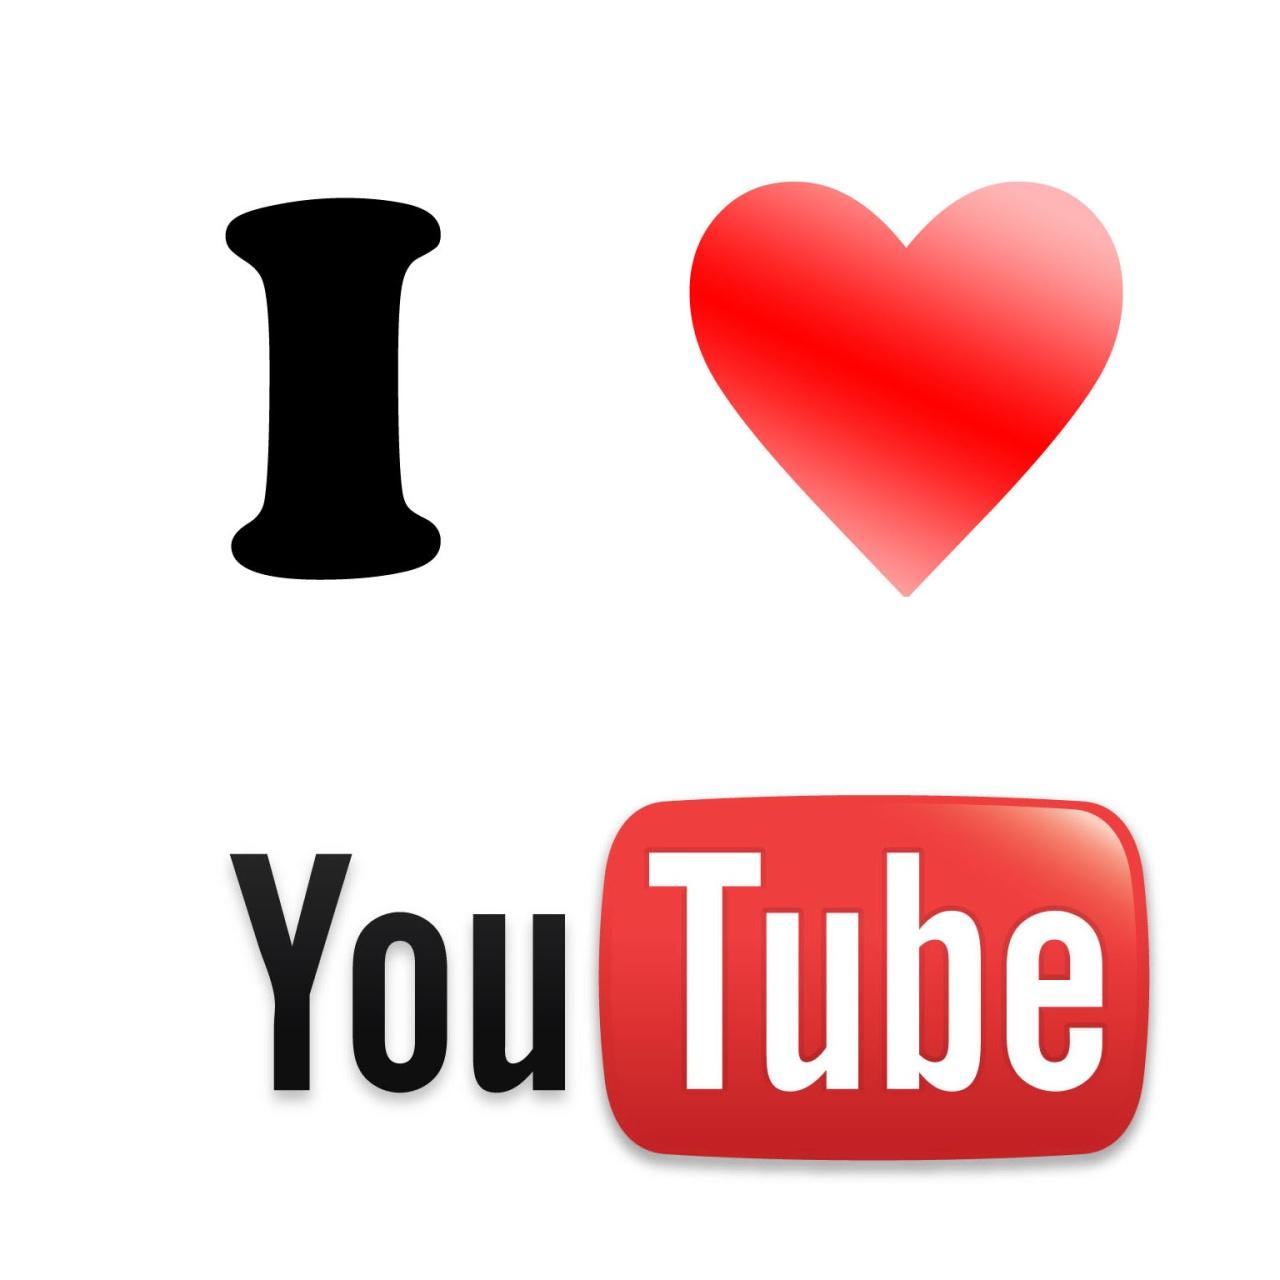 luli in love you tube: